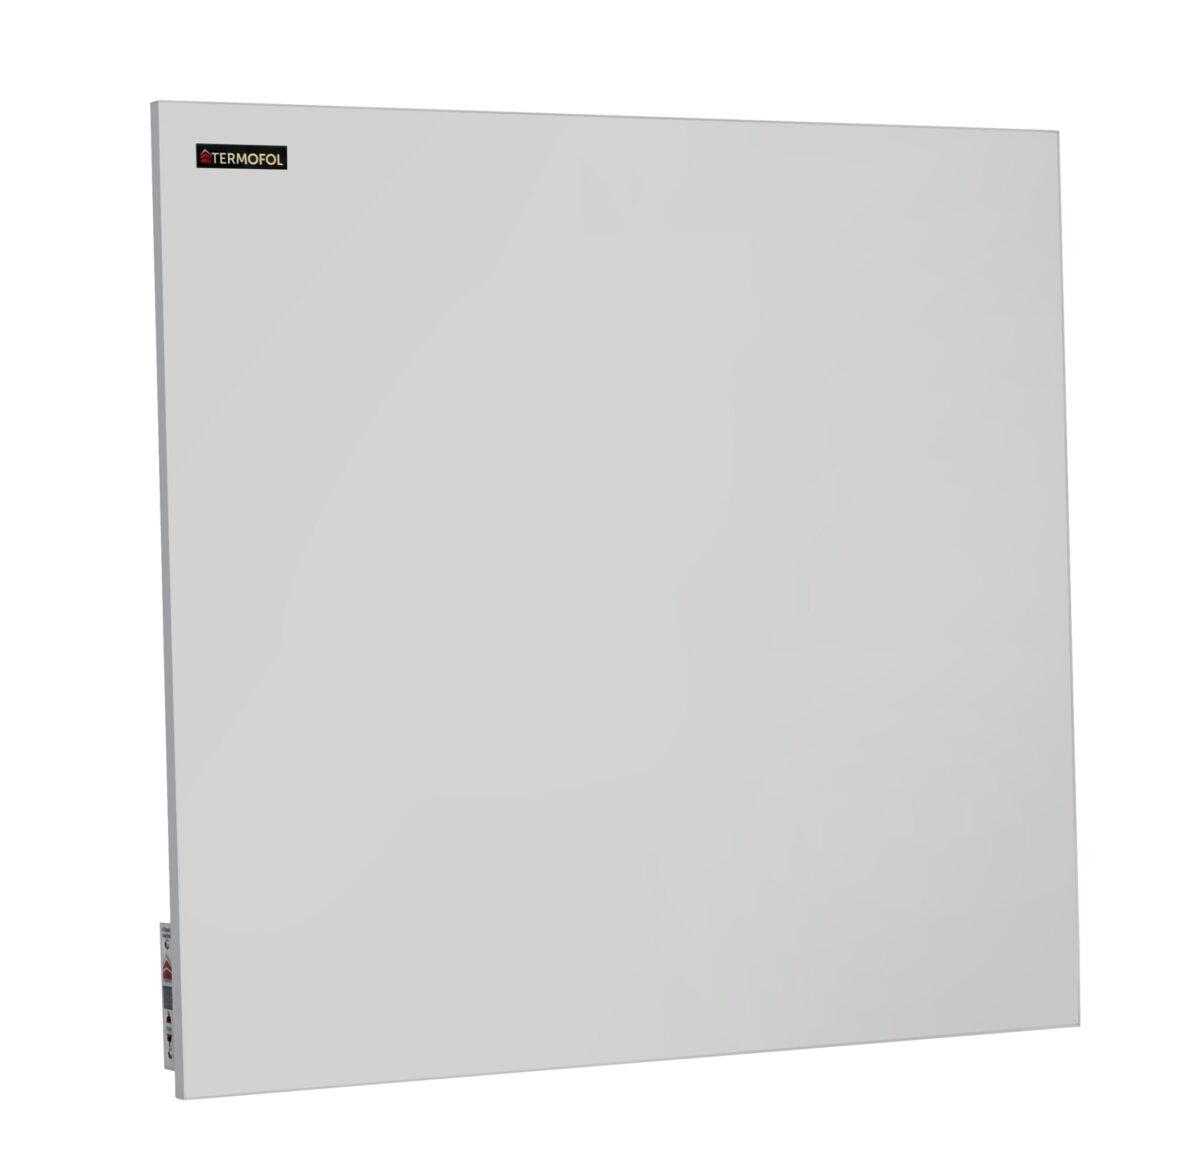 panele-grzewcze-termofol-2